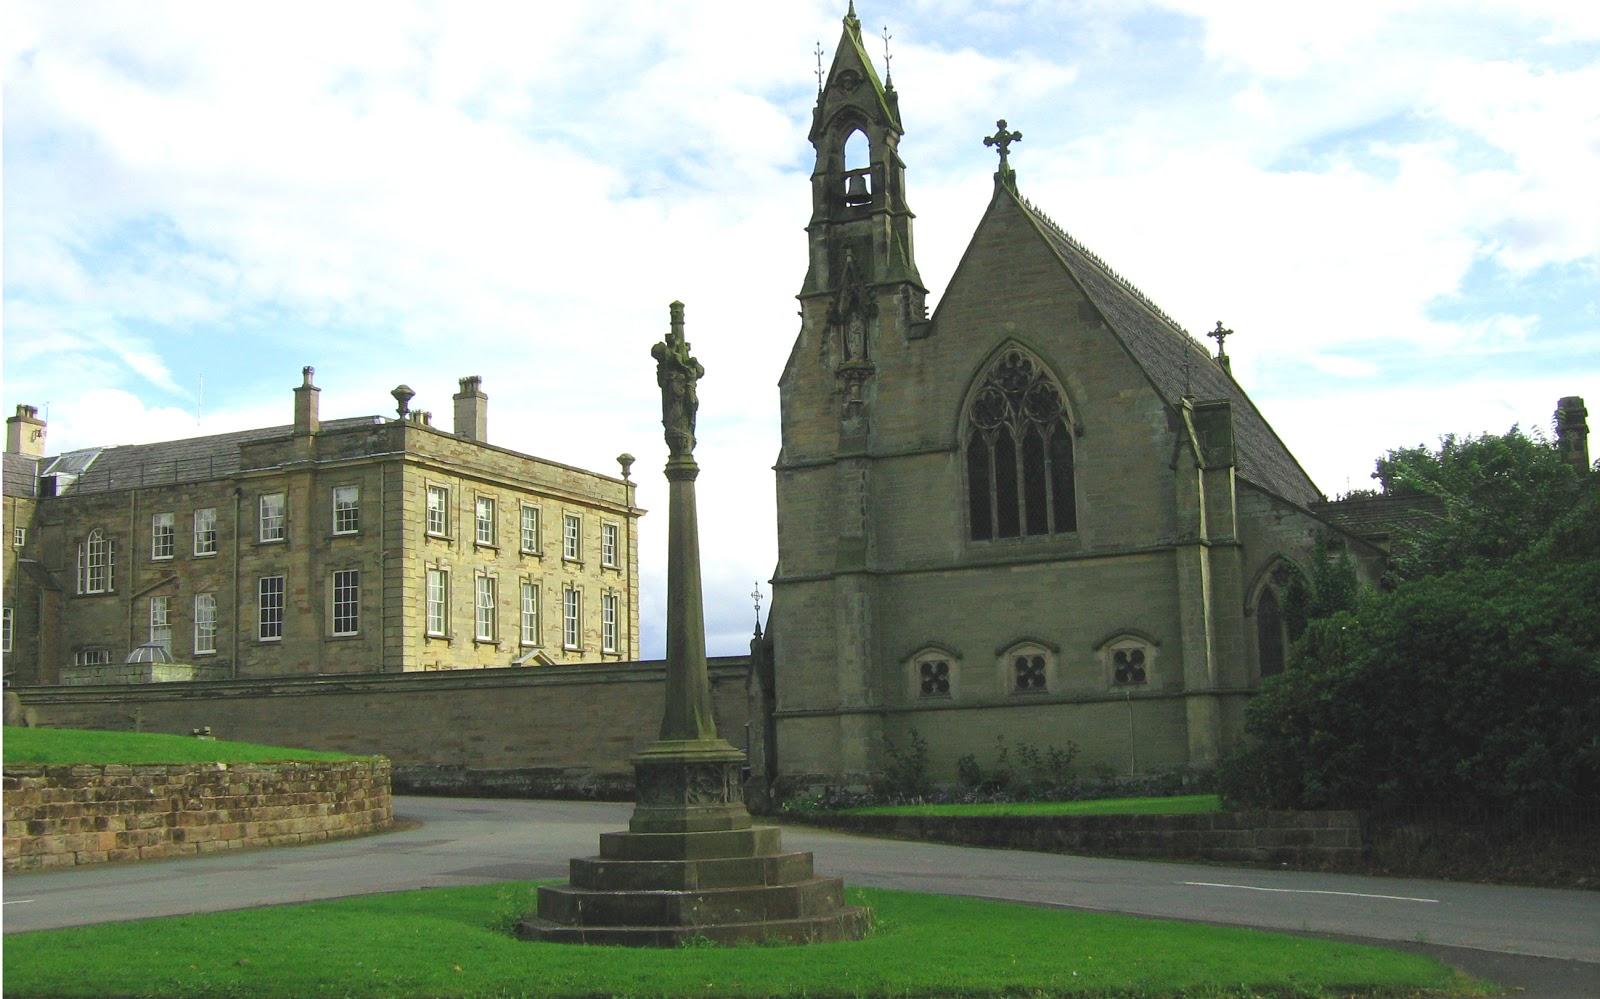 Swynnerton village